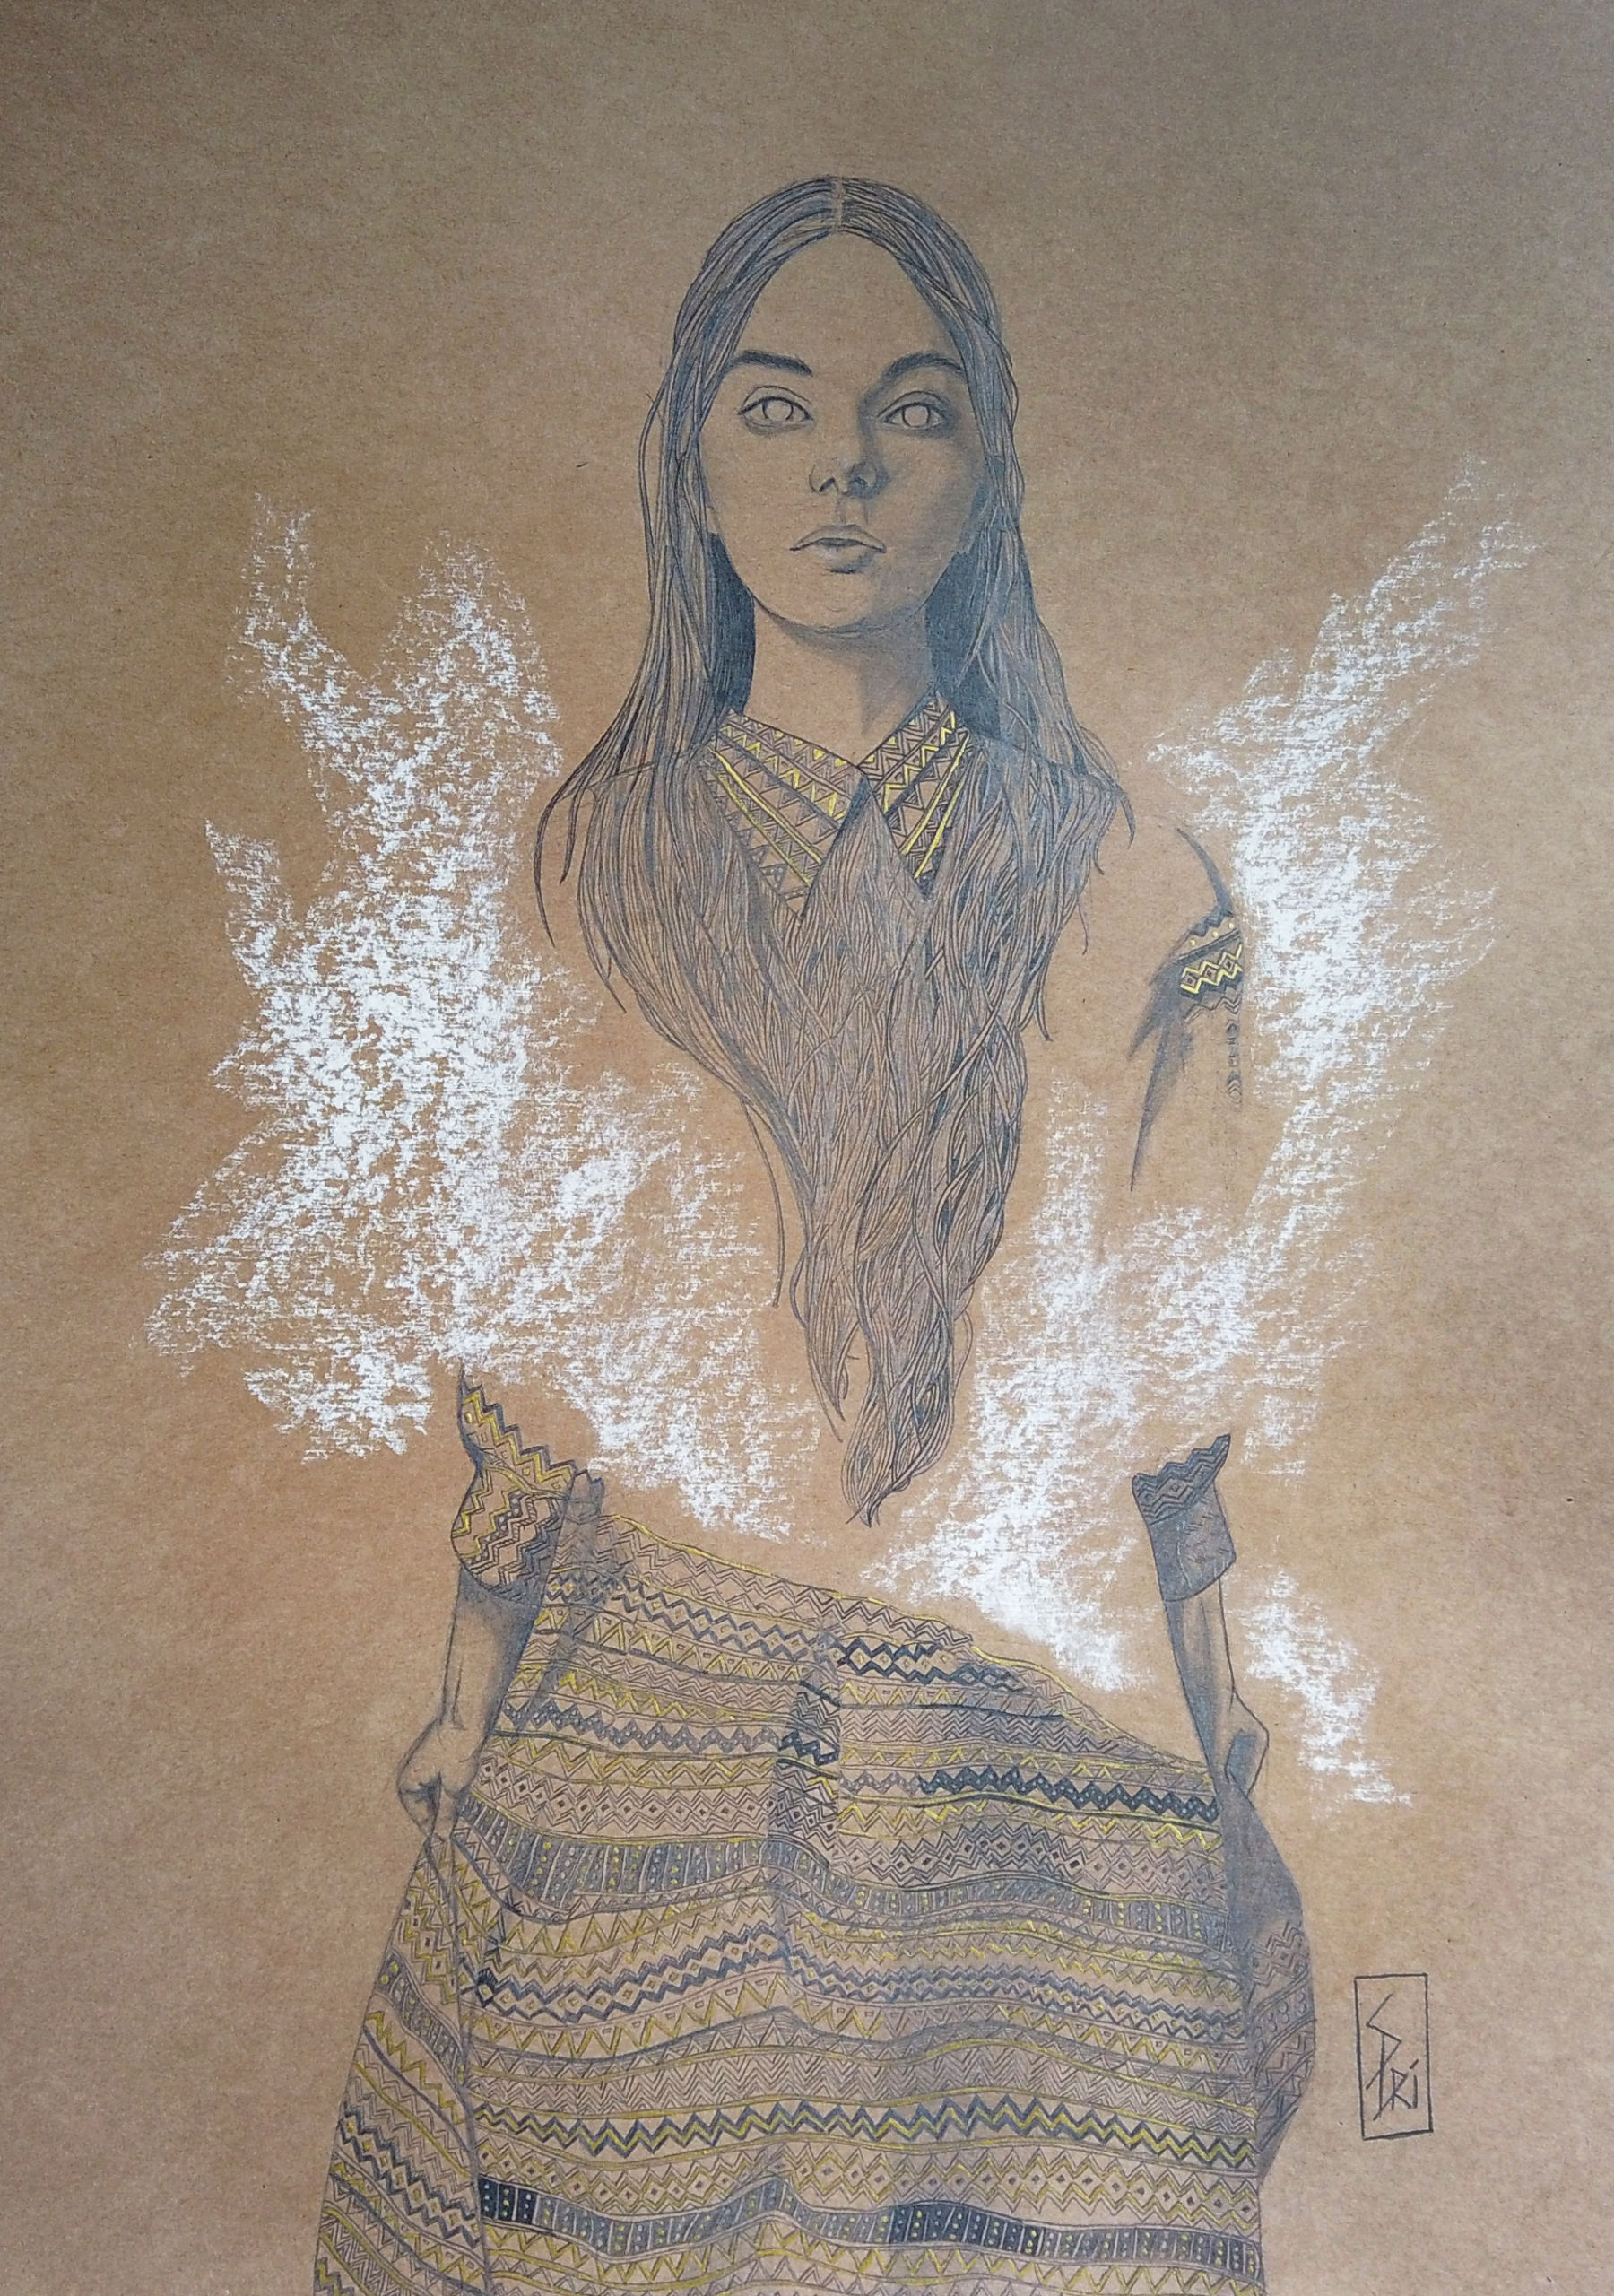 dessin au crayon graphite par la dessinatrice Priscilla Seiller